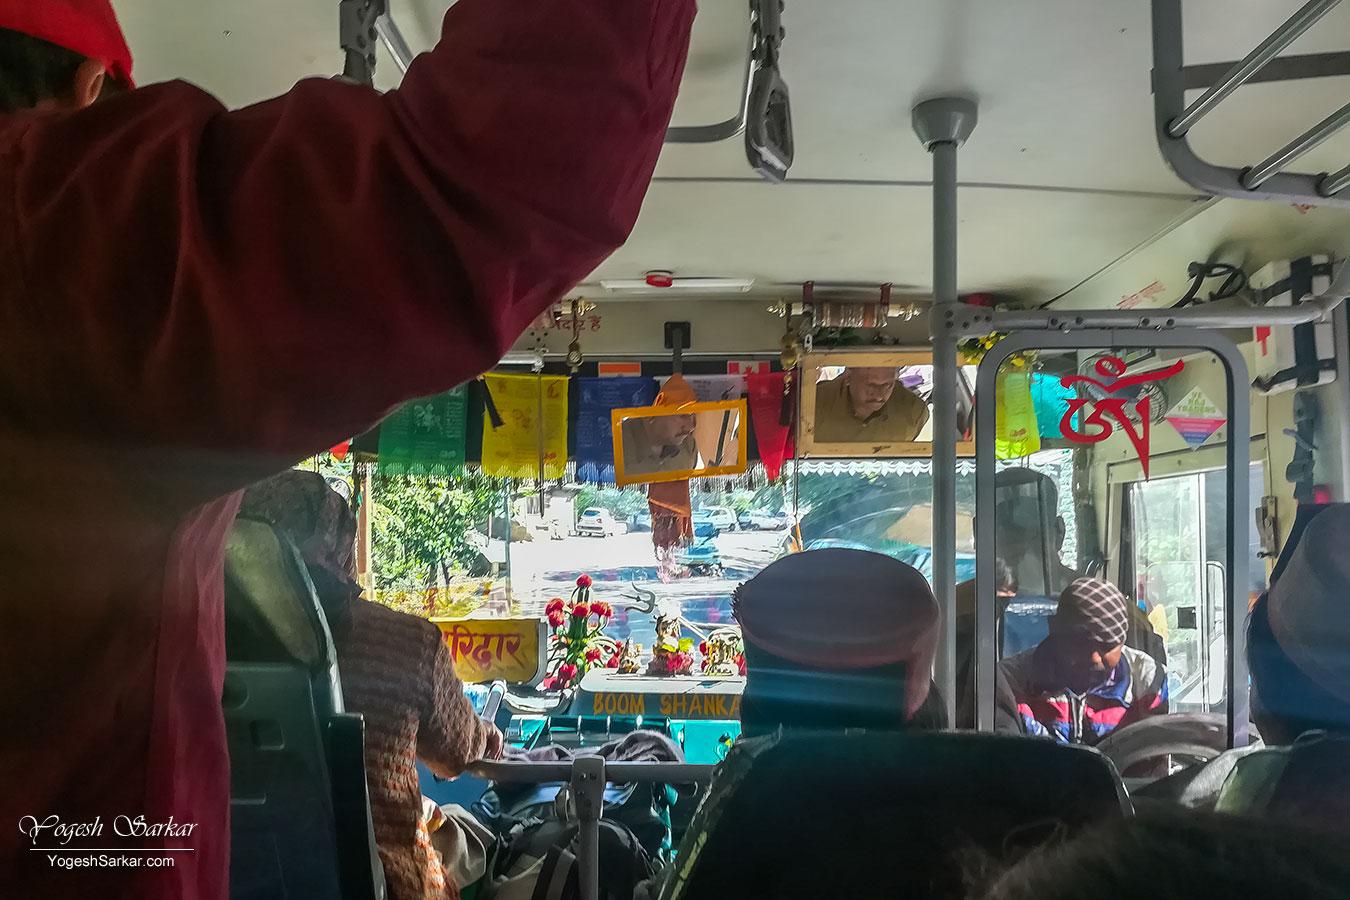 05-haridwar-preckong-peo-hrtc-bus.jpg